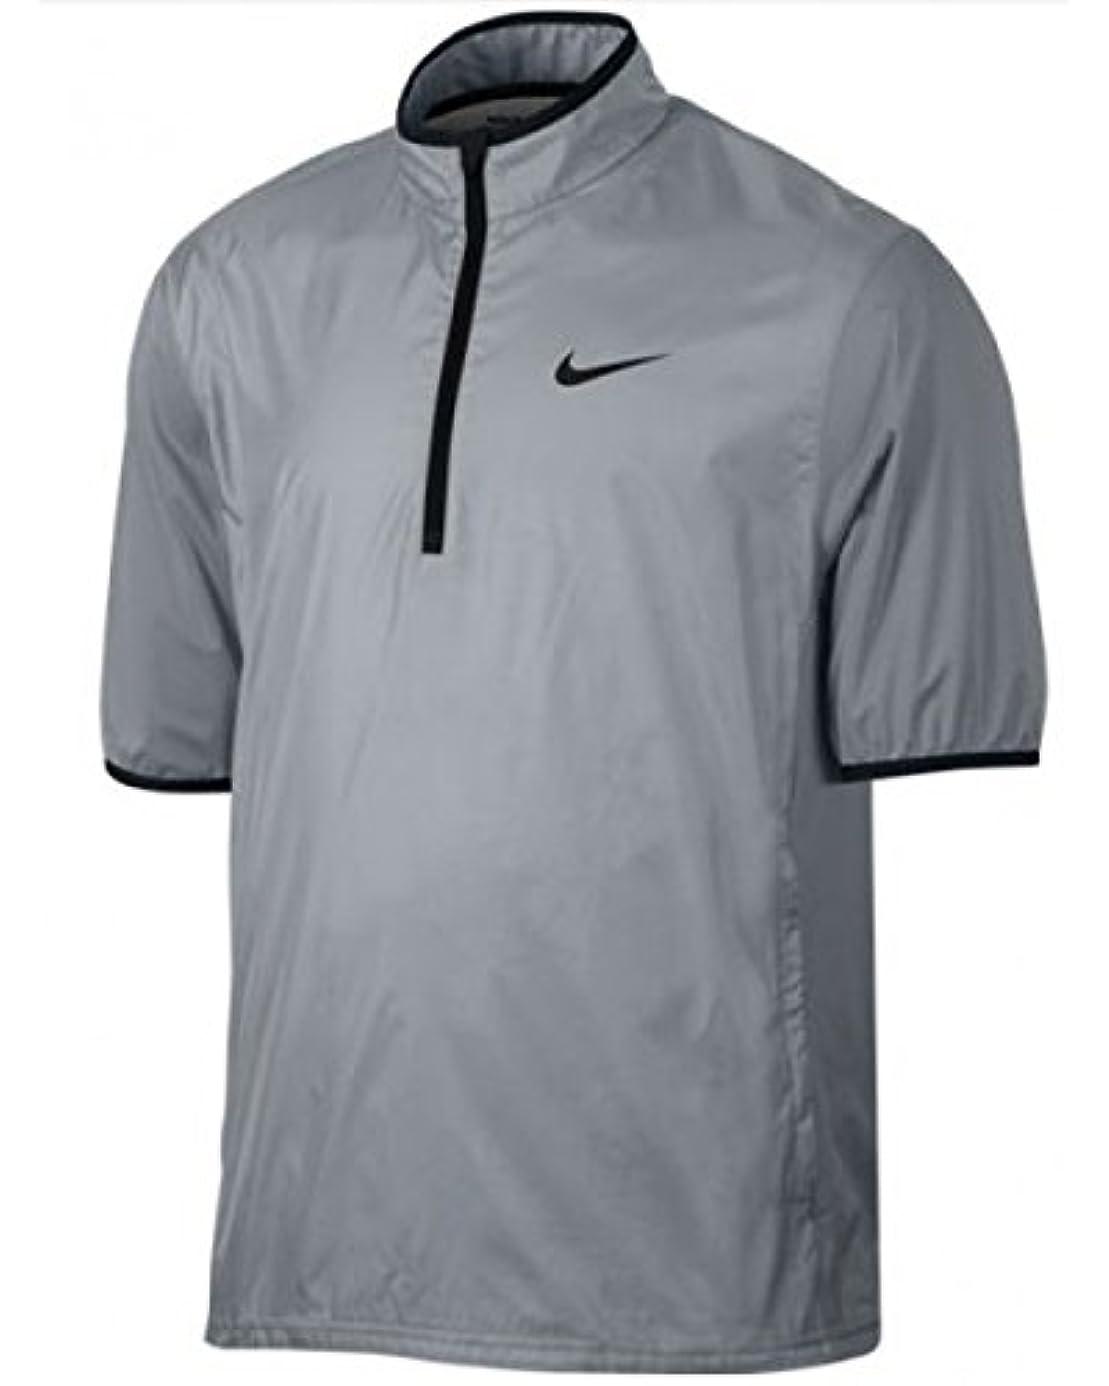 NIKE Golf Closeout Men's Shield Short Sleeve Jacket (Wolf Grey) vvk4235123